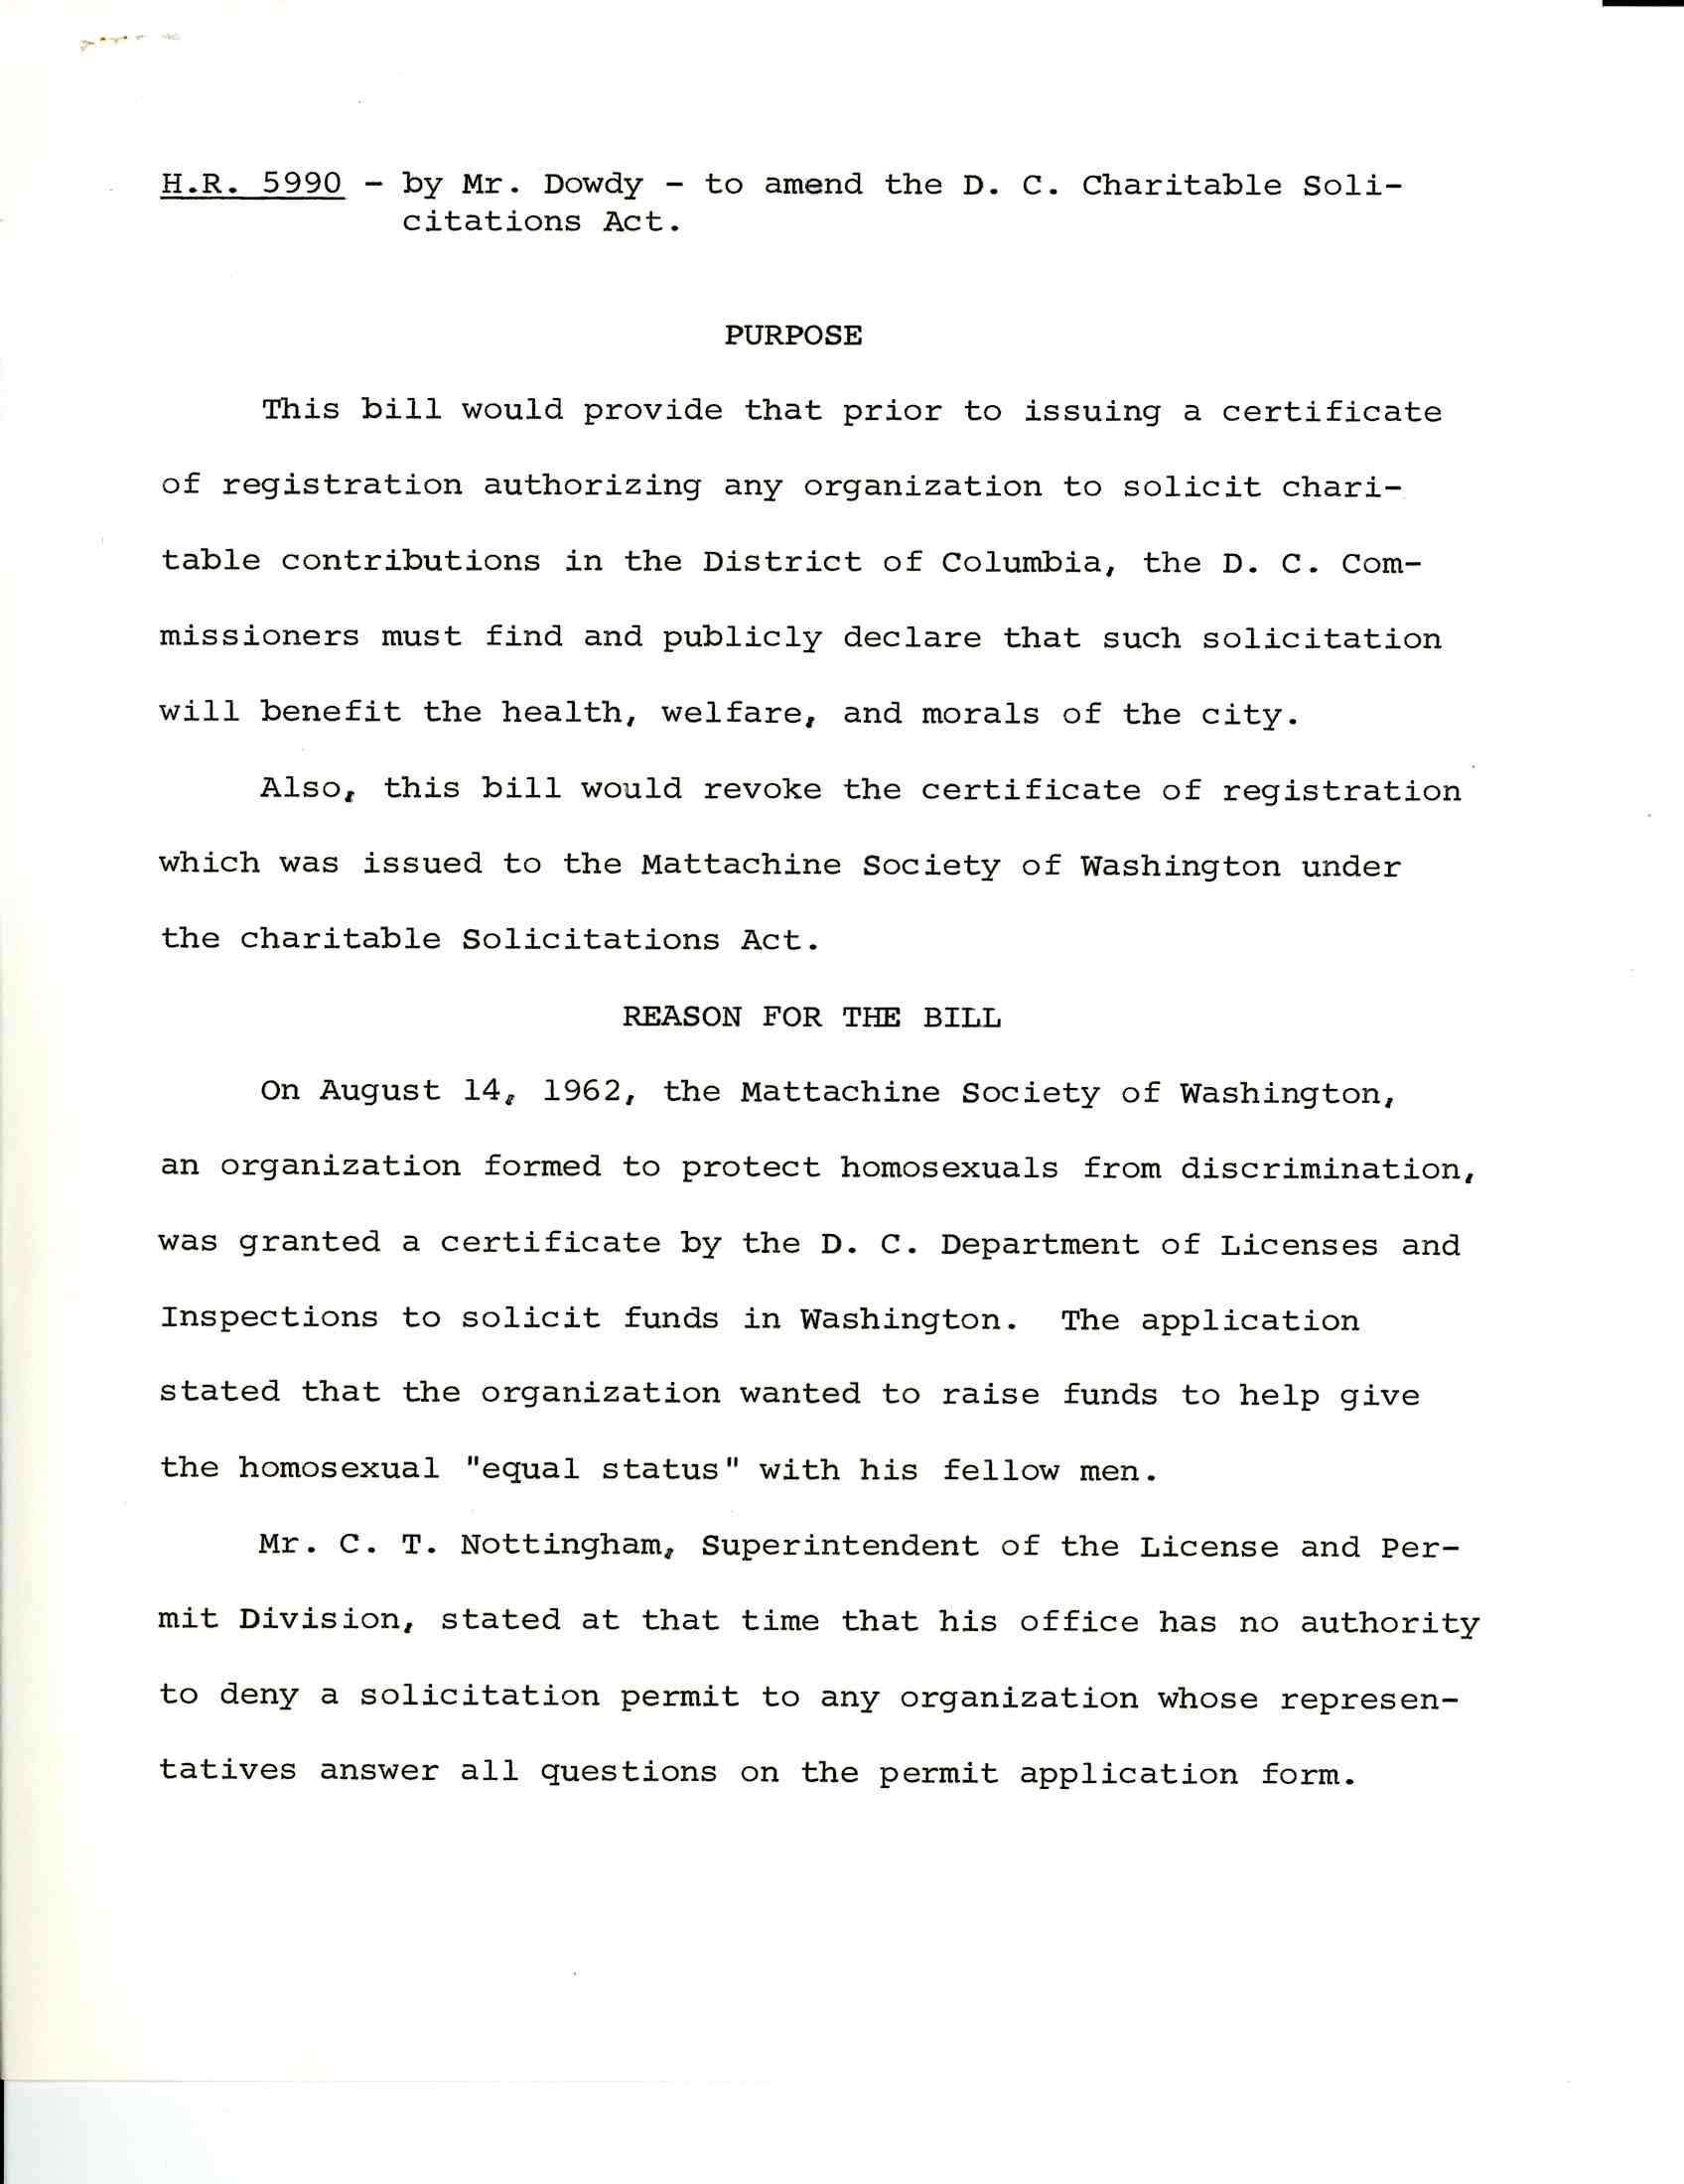 Dowdy Proposal, 88, RG233 H Comm on D.C., Legislative Files, Folder 4 of HR 5990 Bill File, 9E2-2-1-4